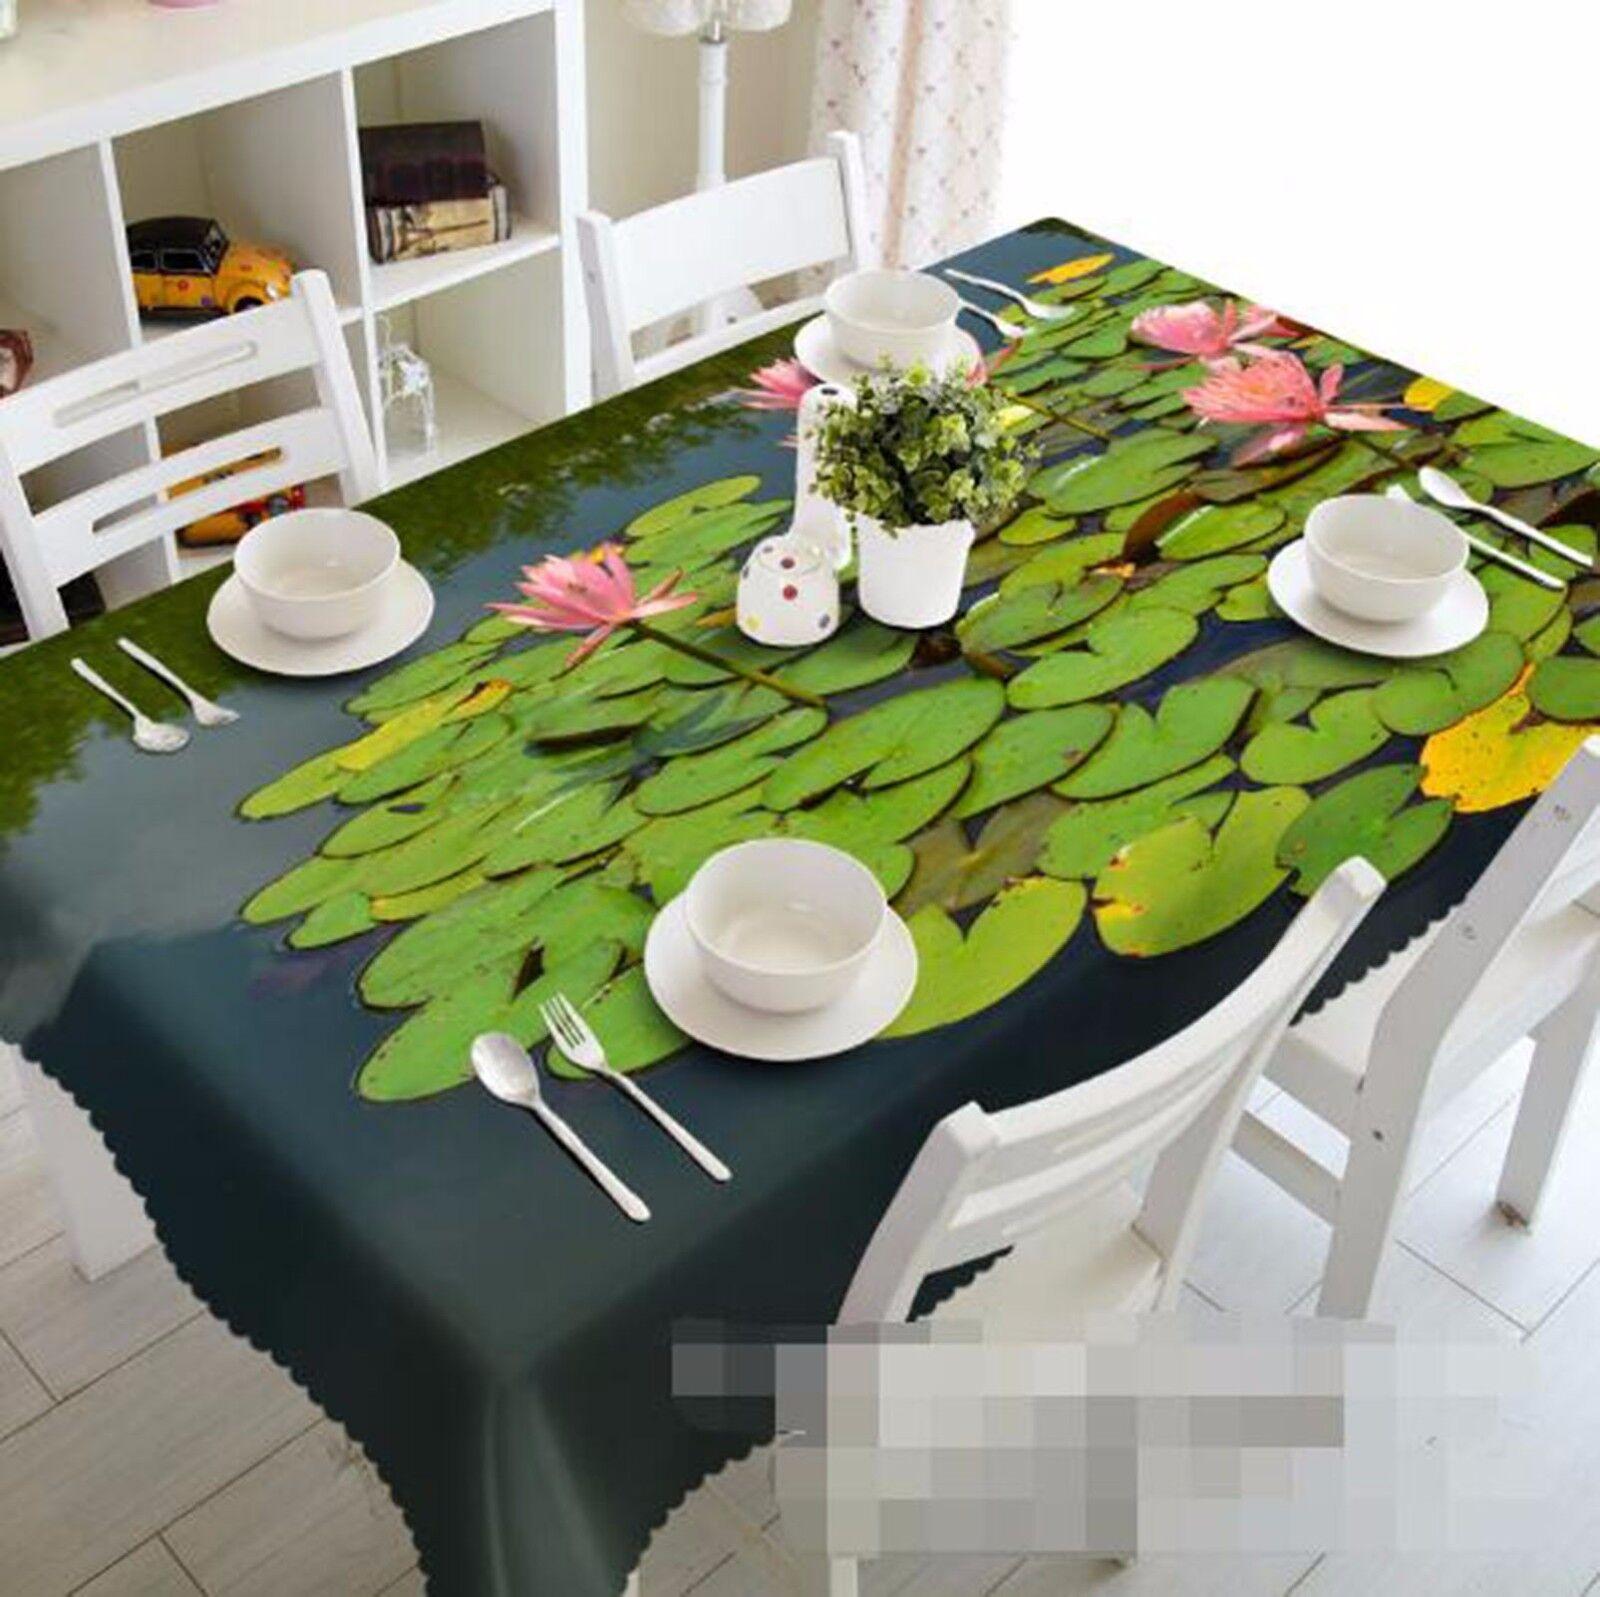 3D Lotu 413 Tablecloth Table Cover Cloth Birthday Party AJ WALLPAPER UK Lemon